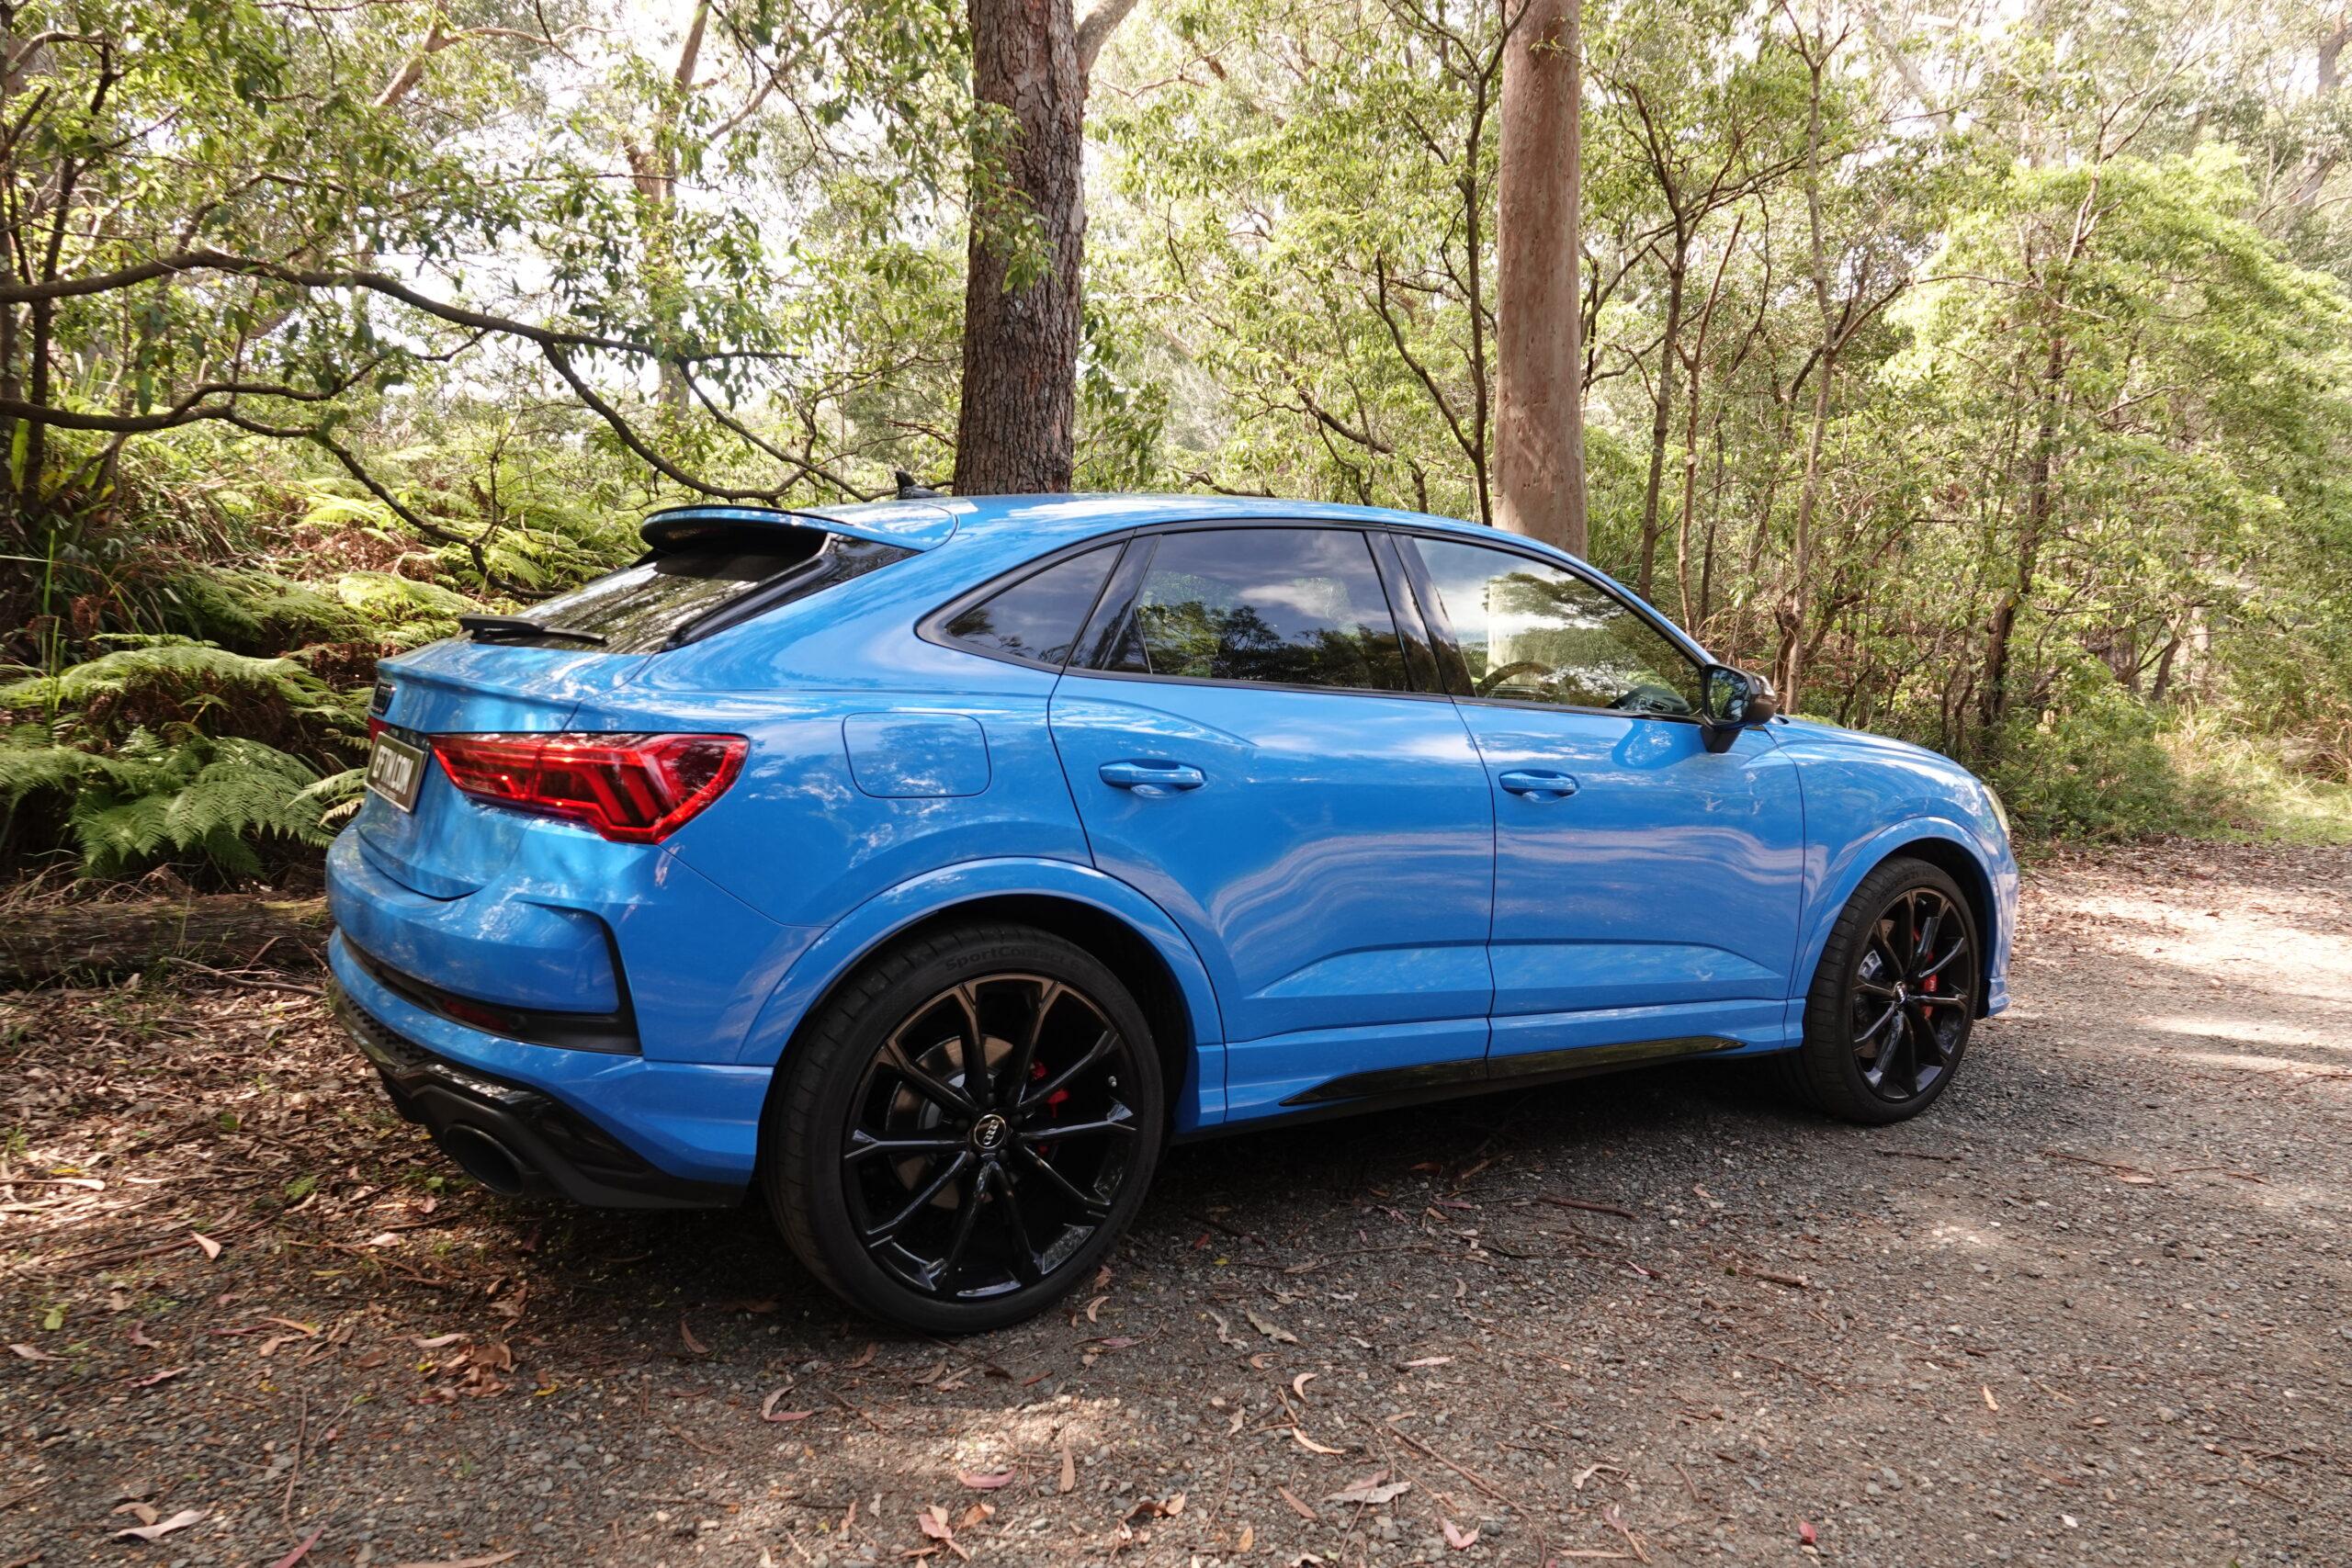 The BLUE Audi RS Q3 Sportback